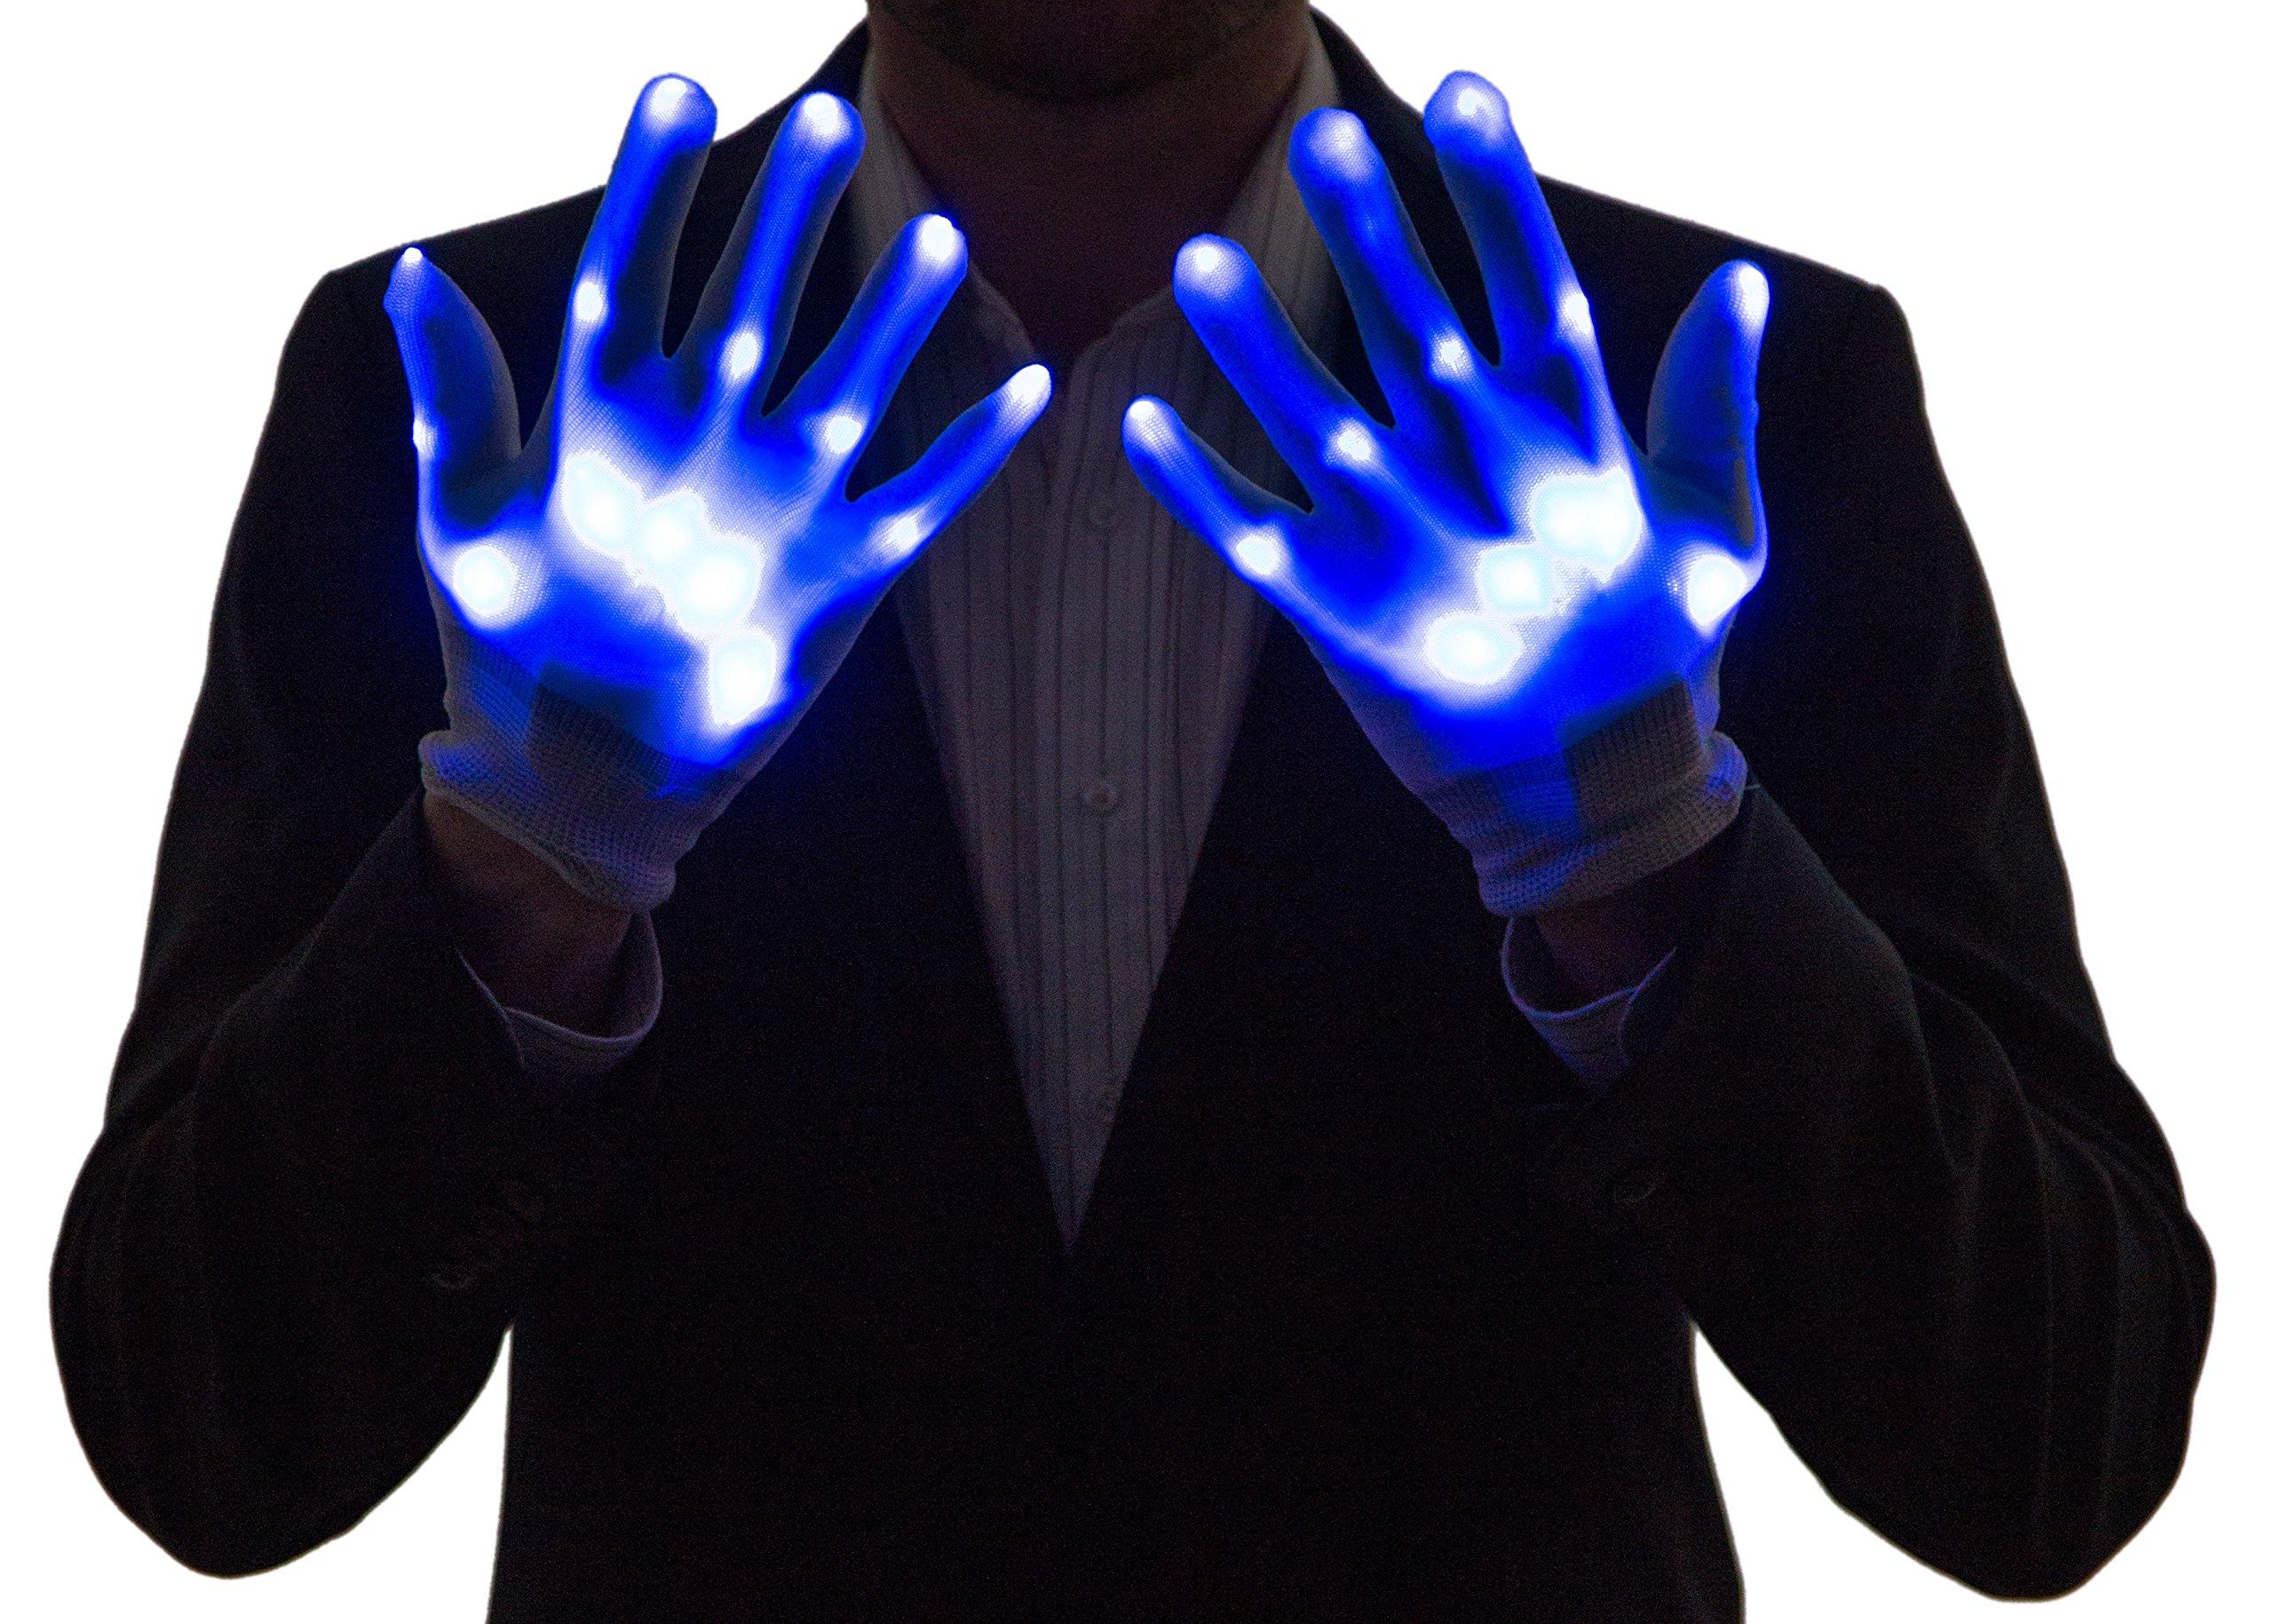 Neon Nightlife Light Up Gloves for Kids, LED, Blue by Neon Nightlife (Image #2)